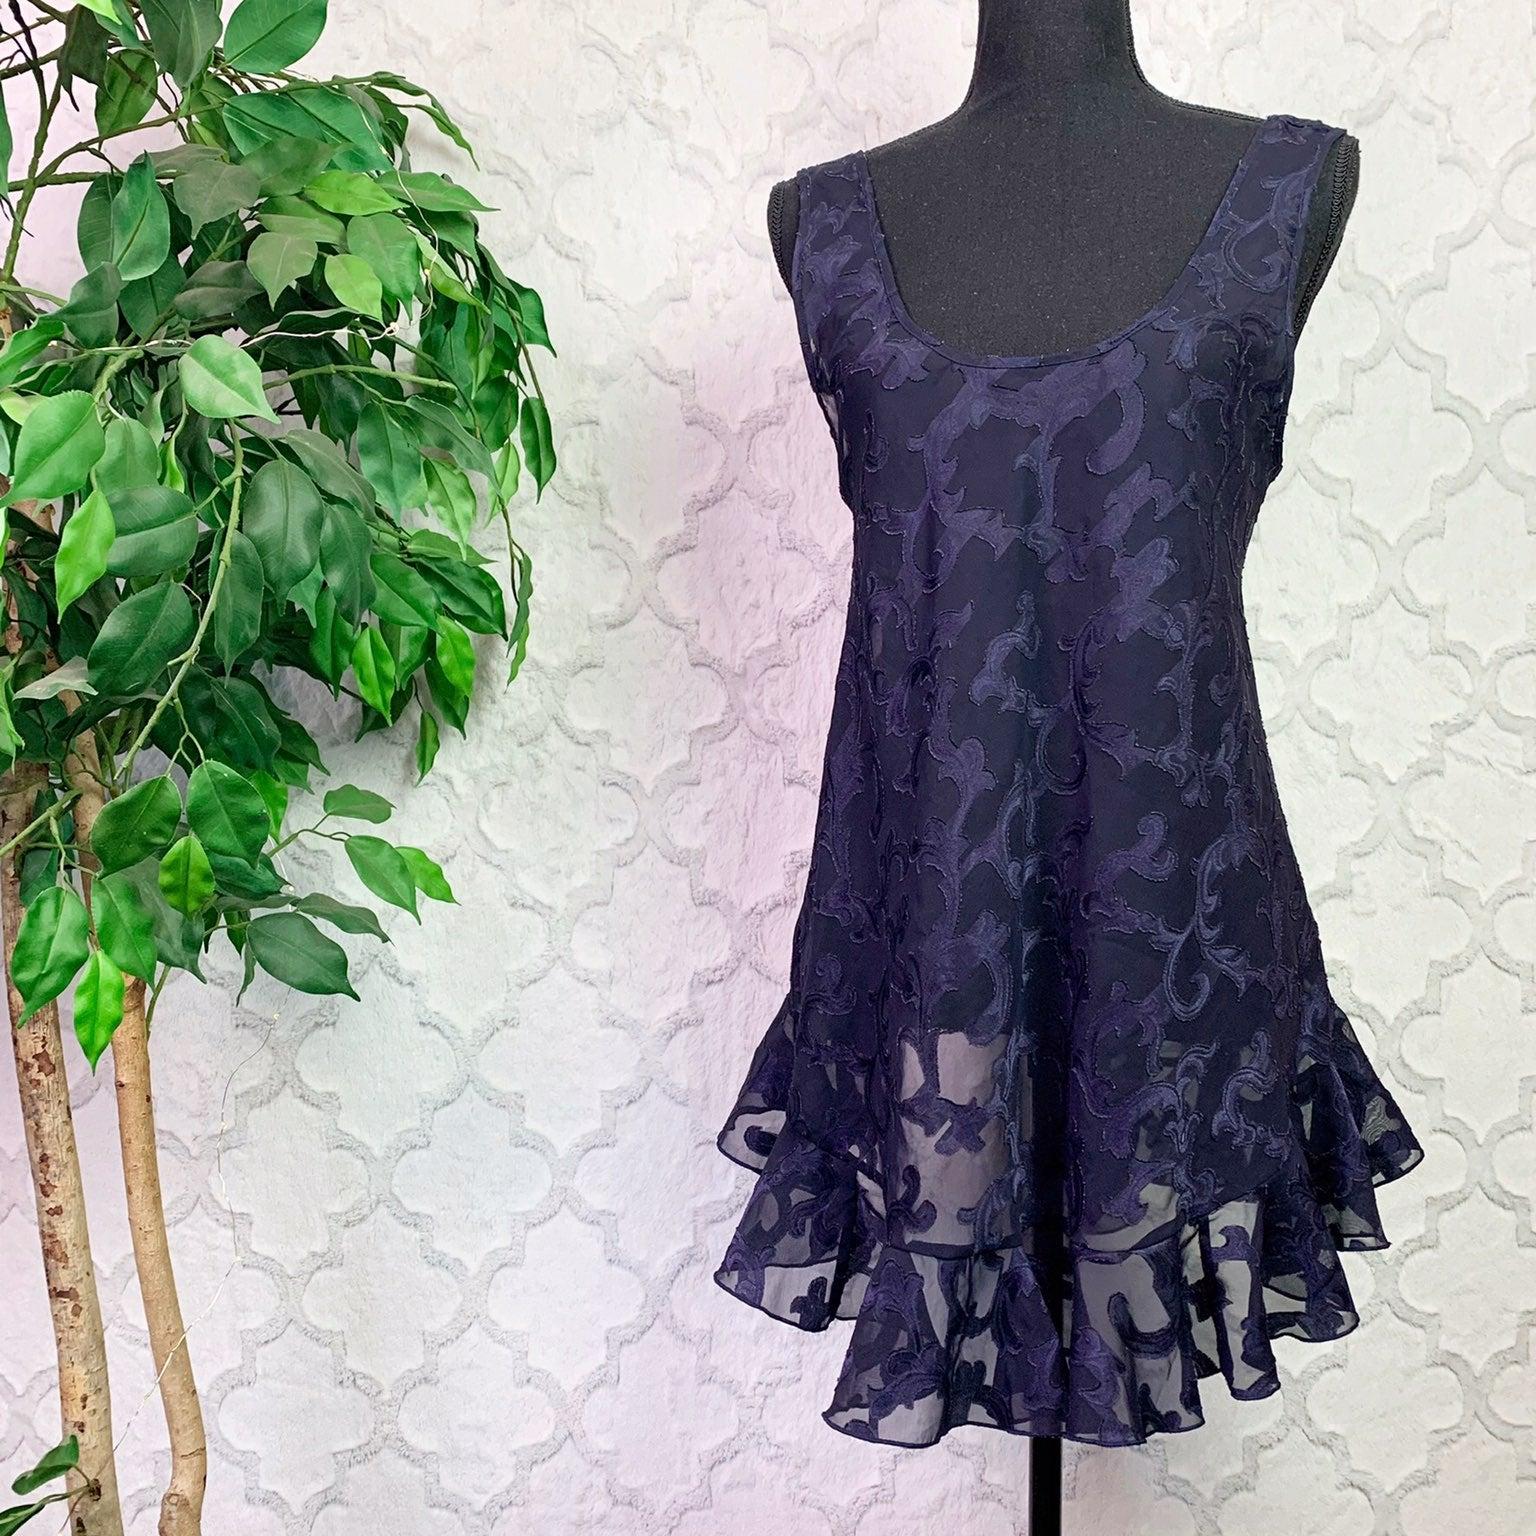 Vintage Victoria's Secret Navy Nightgown